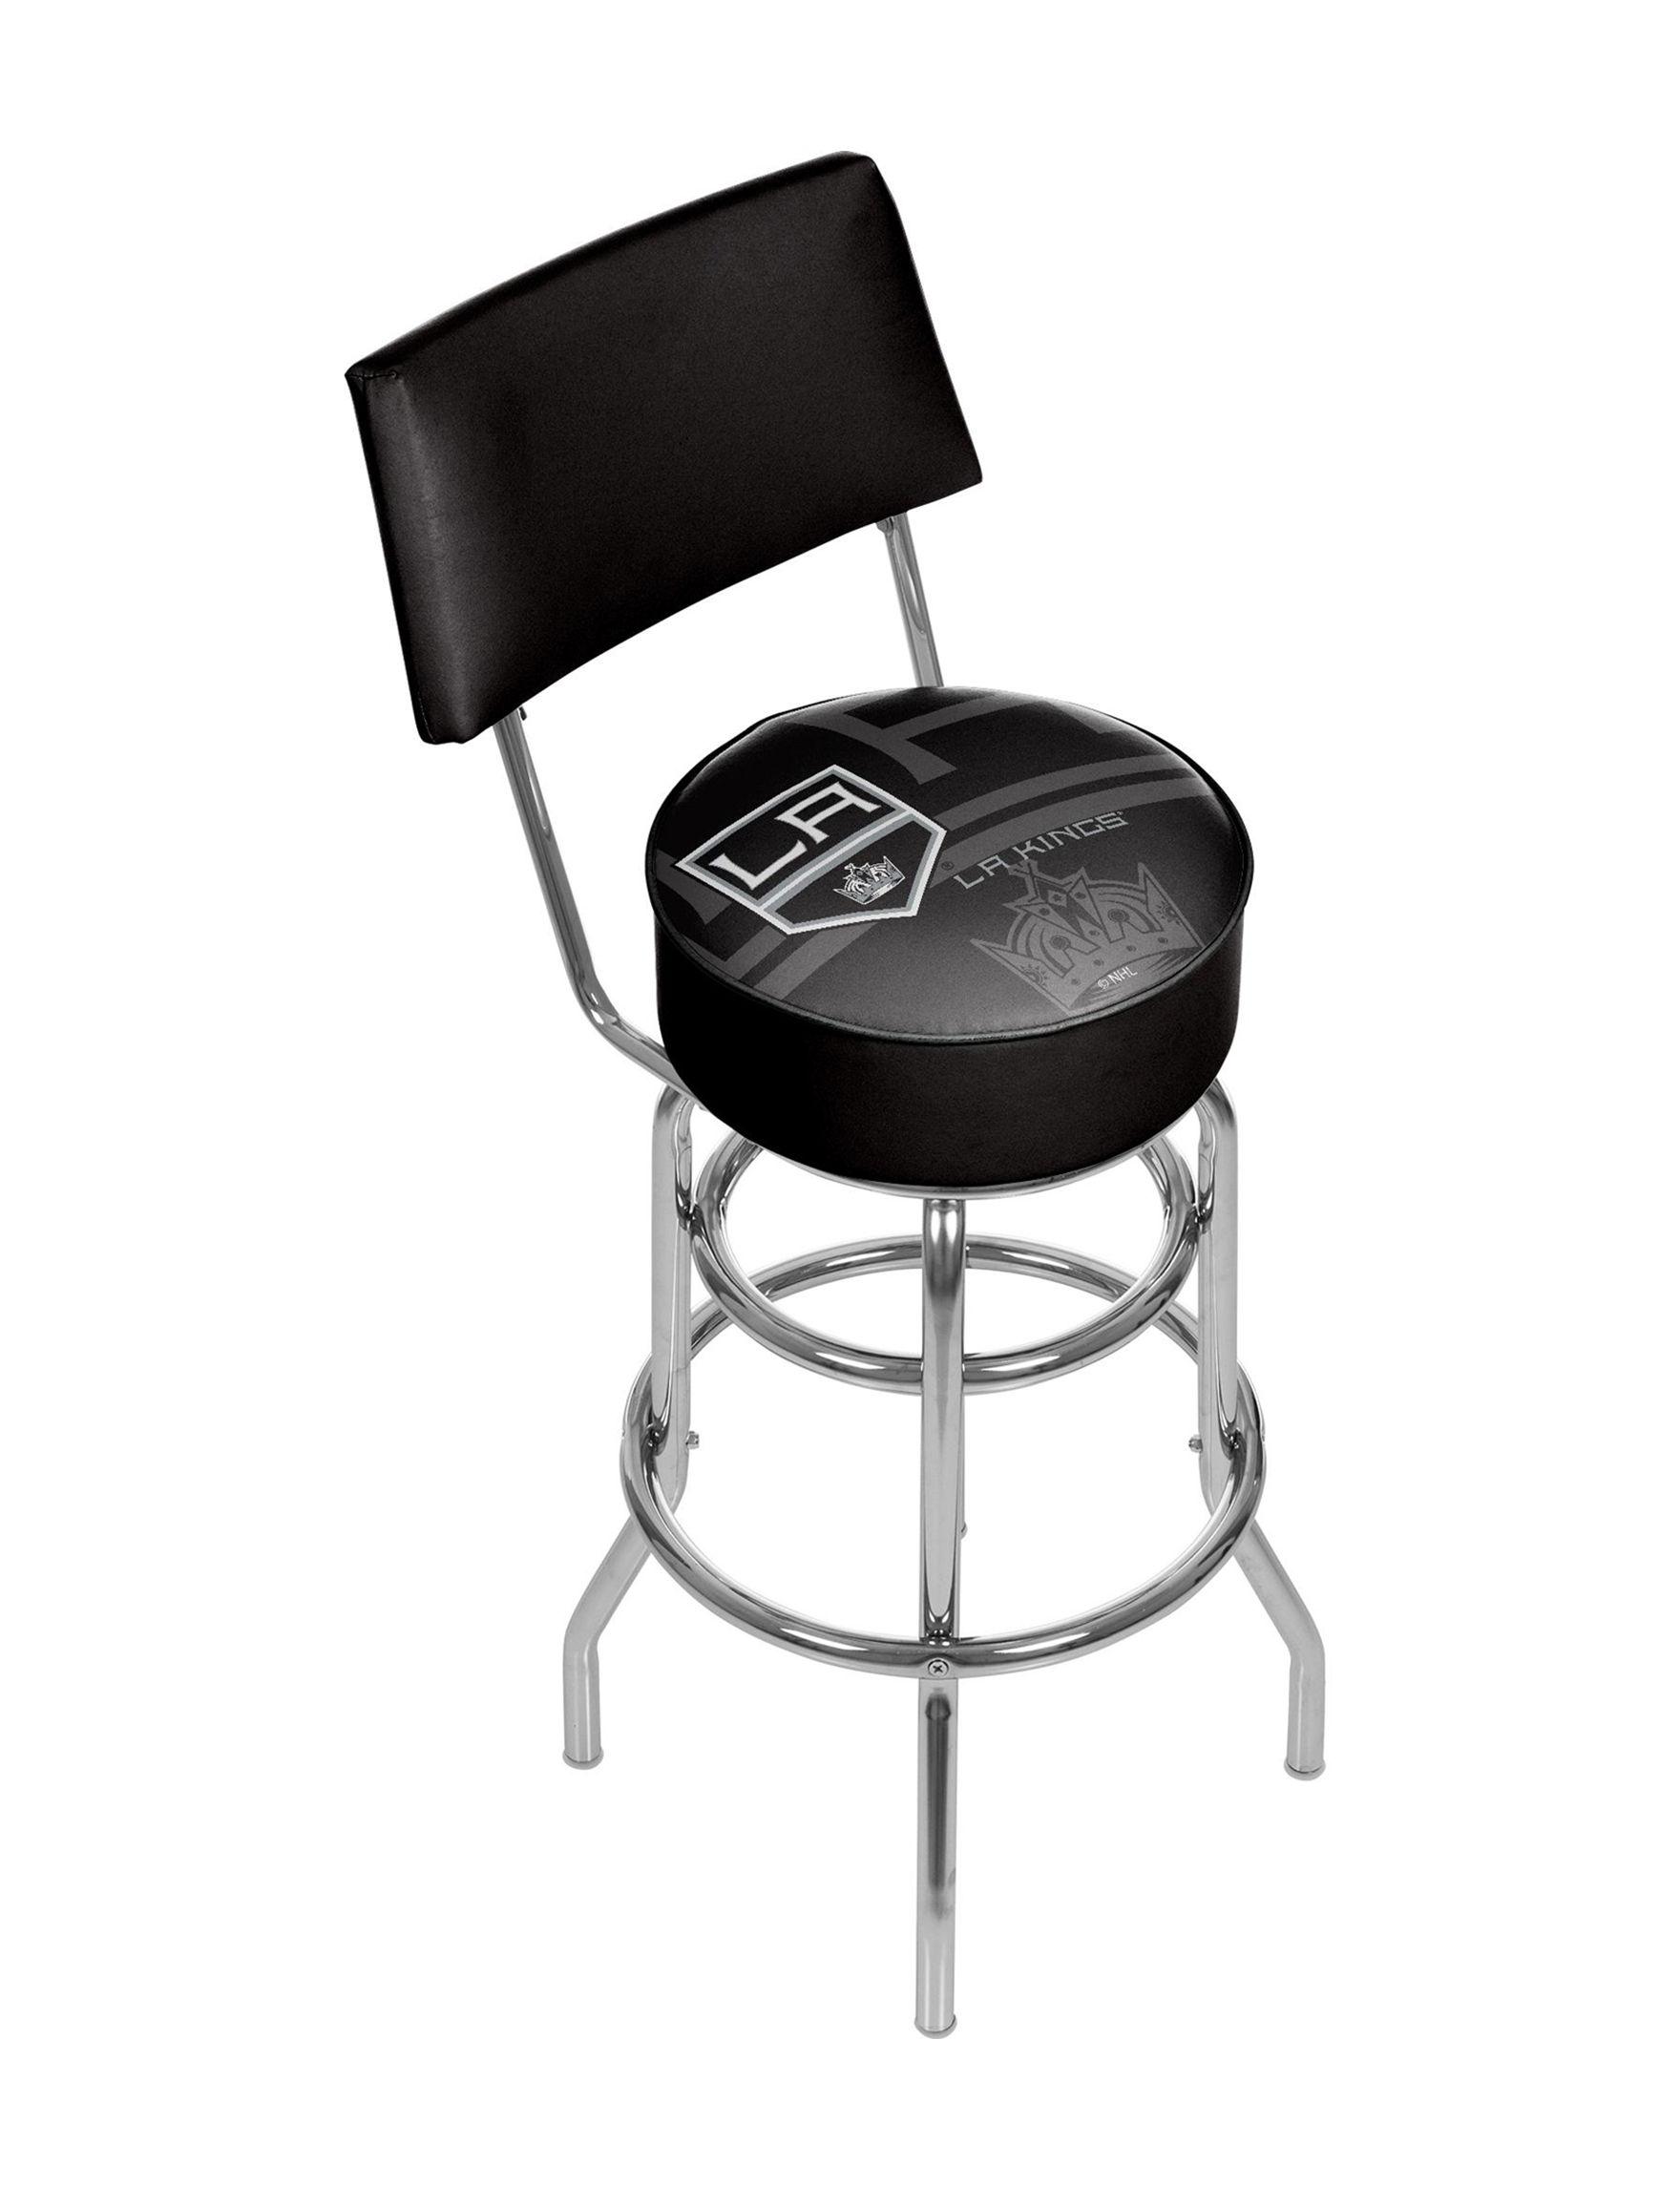 Trademark Global Black / White Bar & Kitchen Stools Game Room Kitchen & Dining Furniture